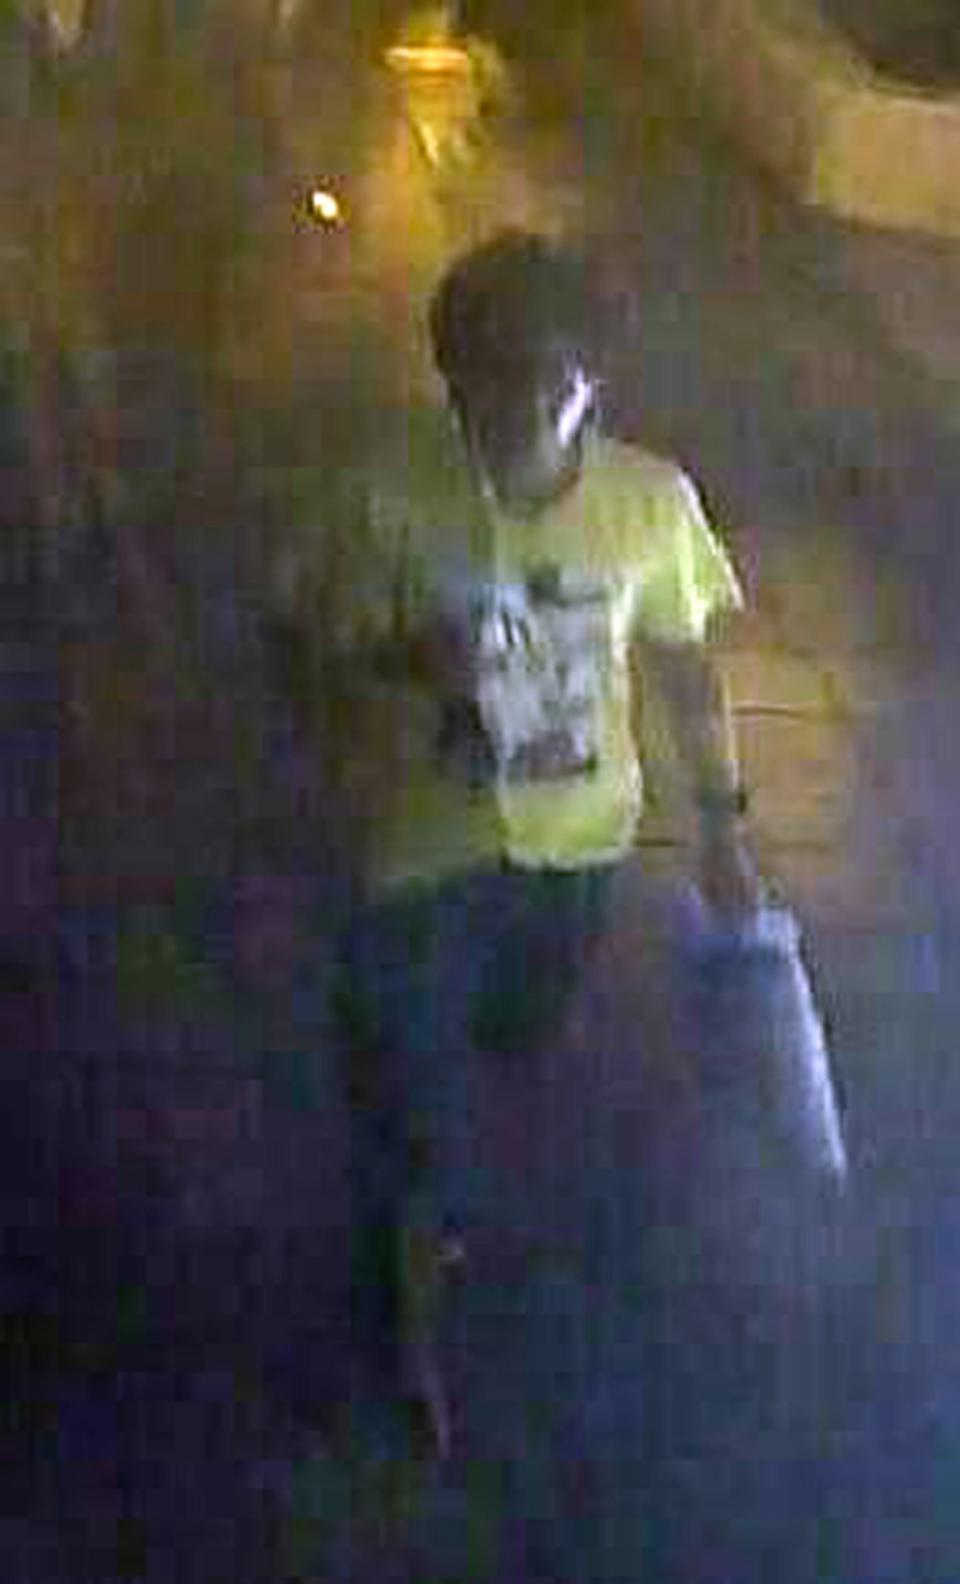 جزئیات شناسایی هویت عامل انفجار بانکوک + تصاویر